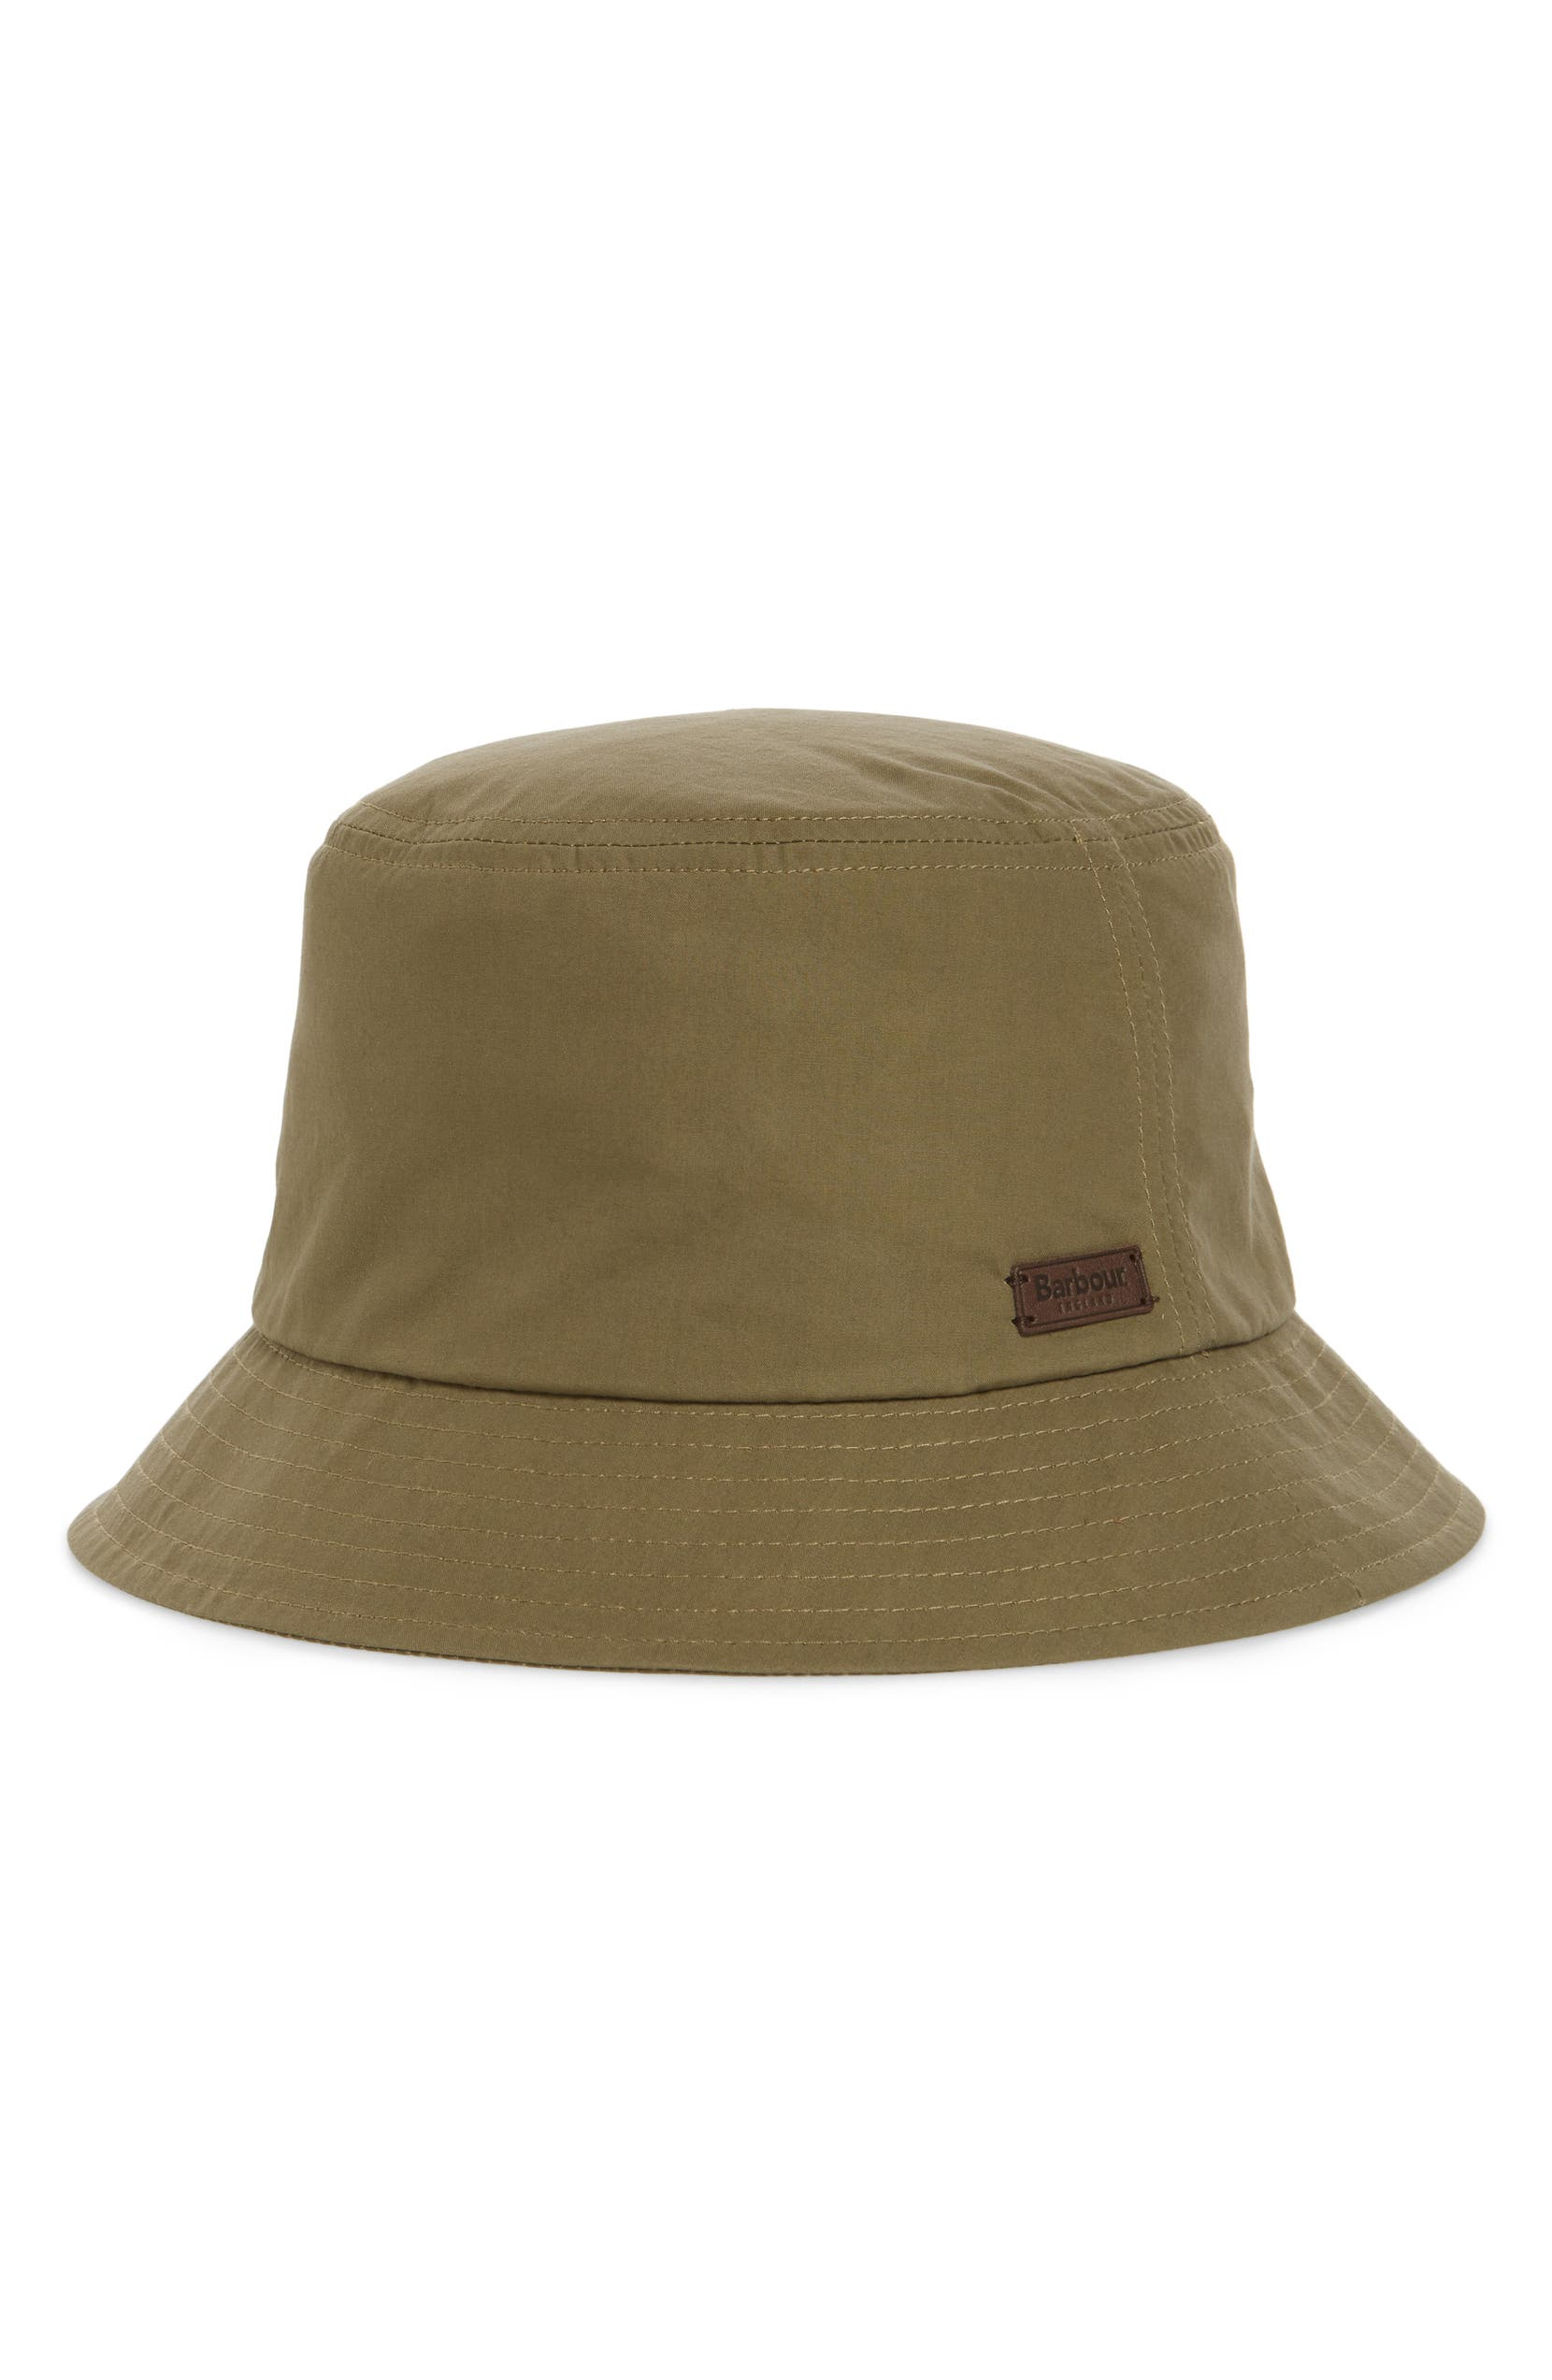 dbd9be0a Barbour Irvine Wax Bucket Hat | Nordstrom